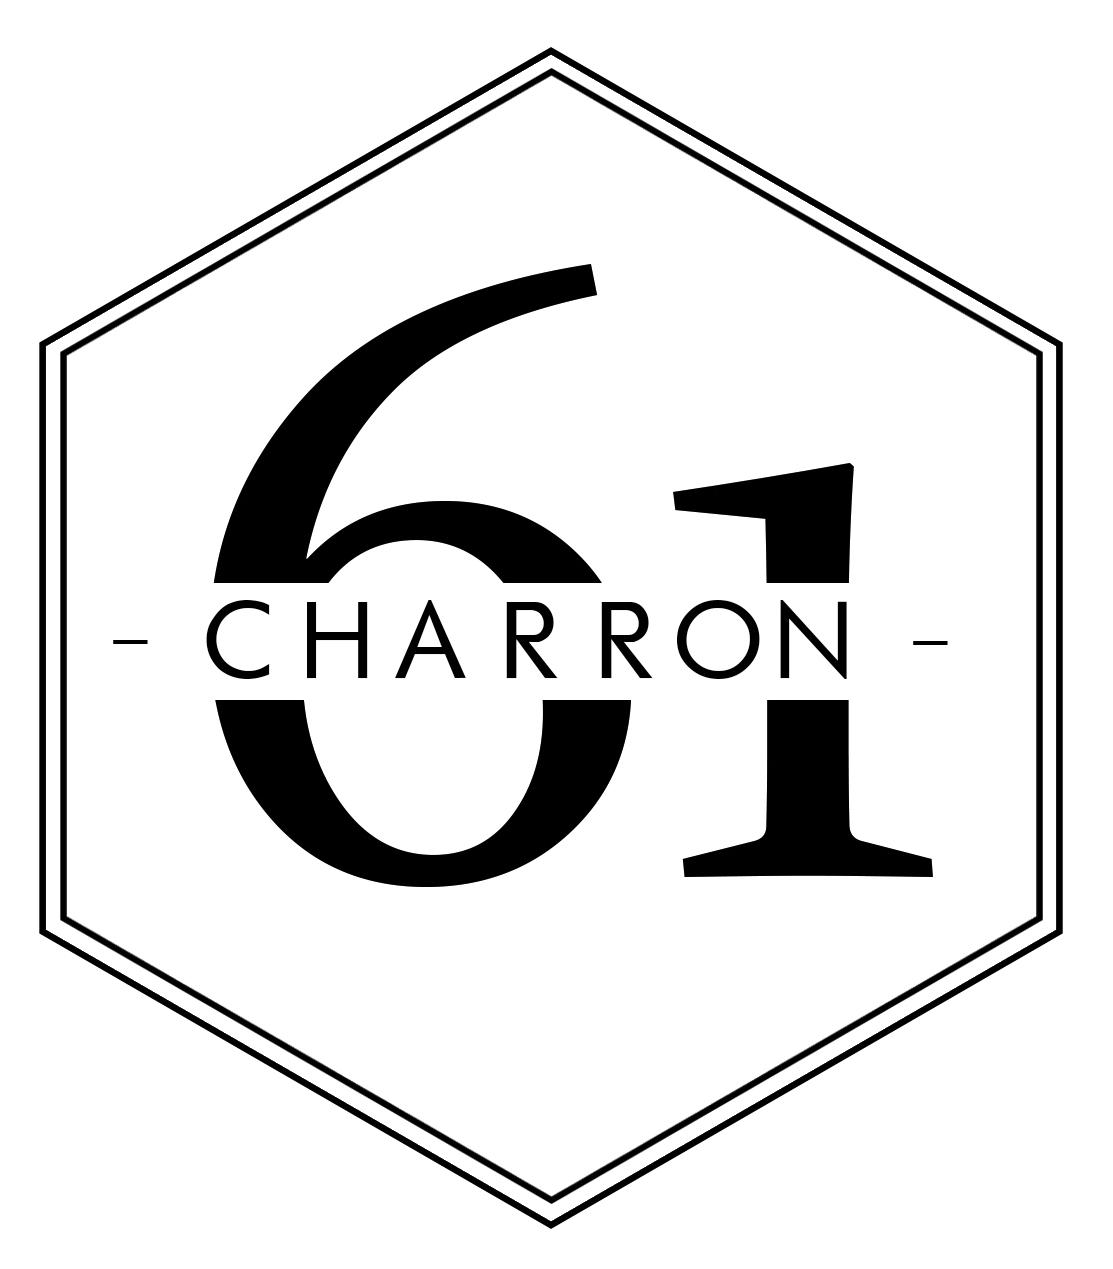 61 Charron